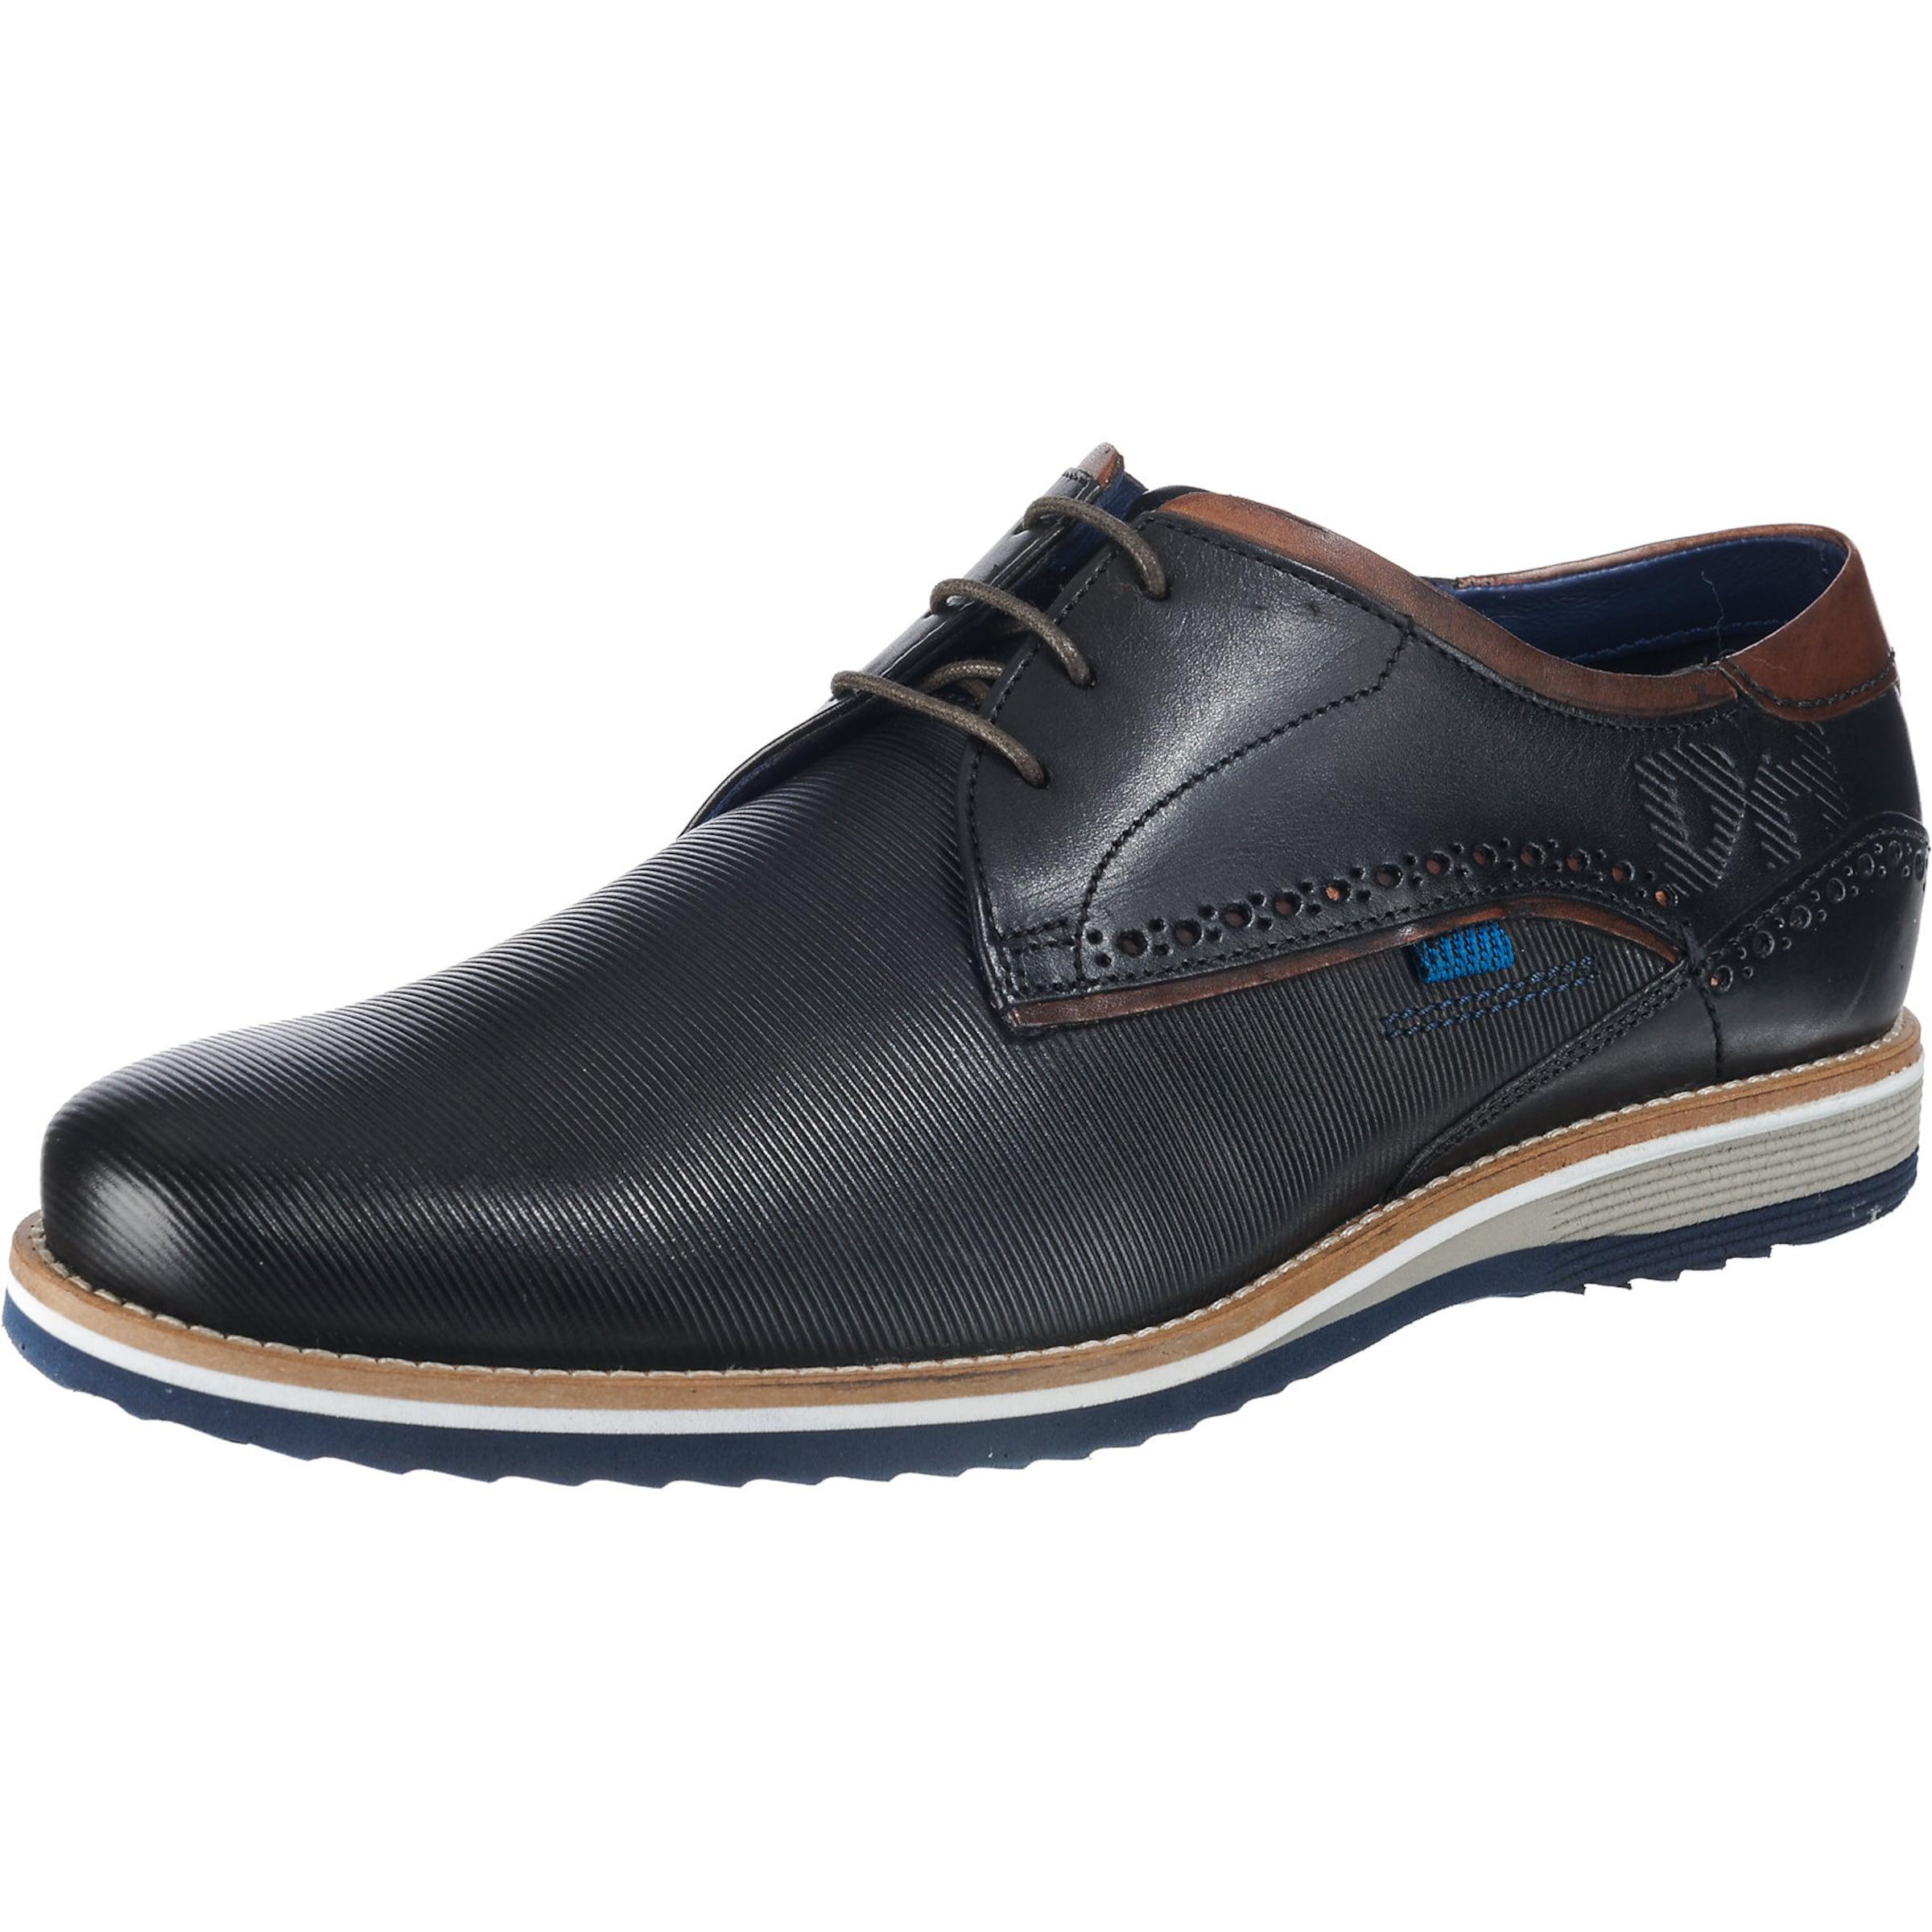 DANIEL HECHTER | Freizeit Schuhe